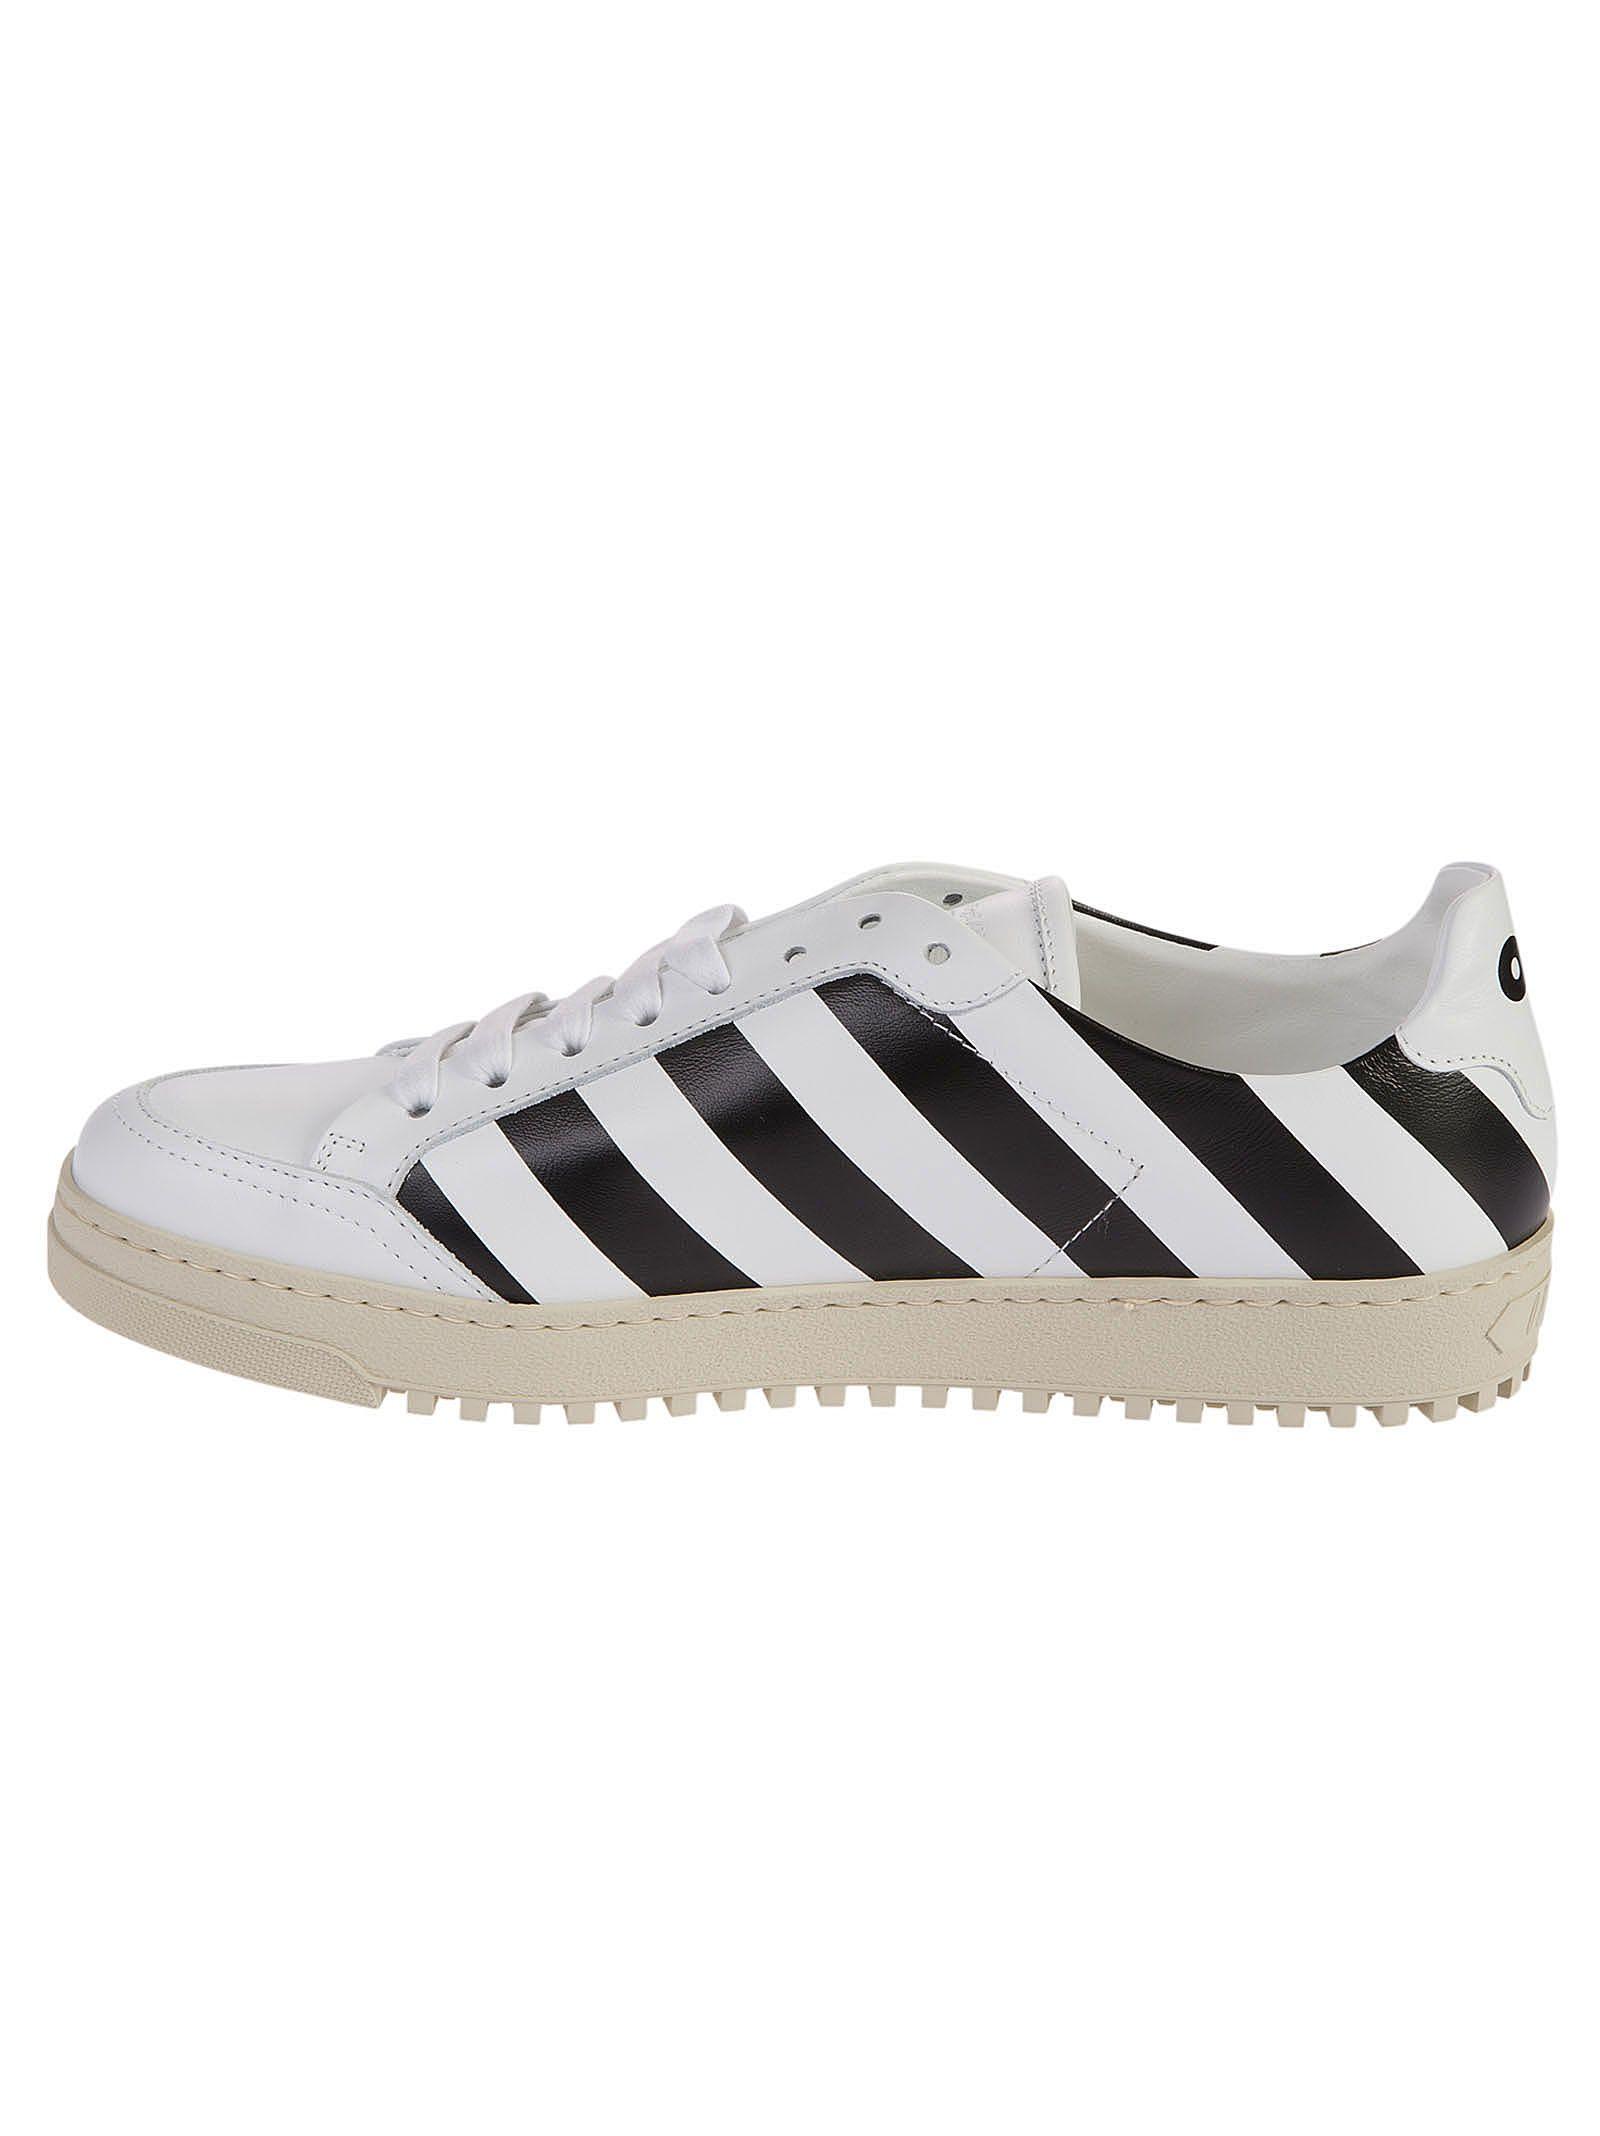 Off-white Diagonal Print Sneakers